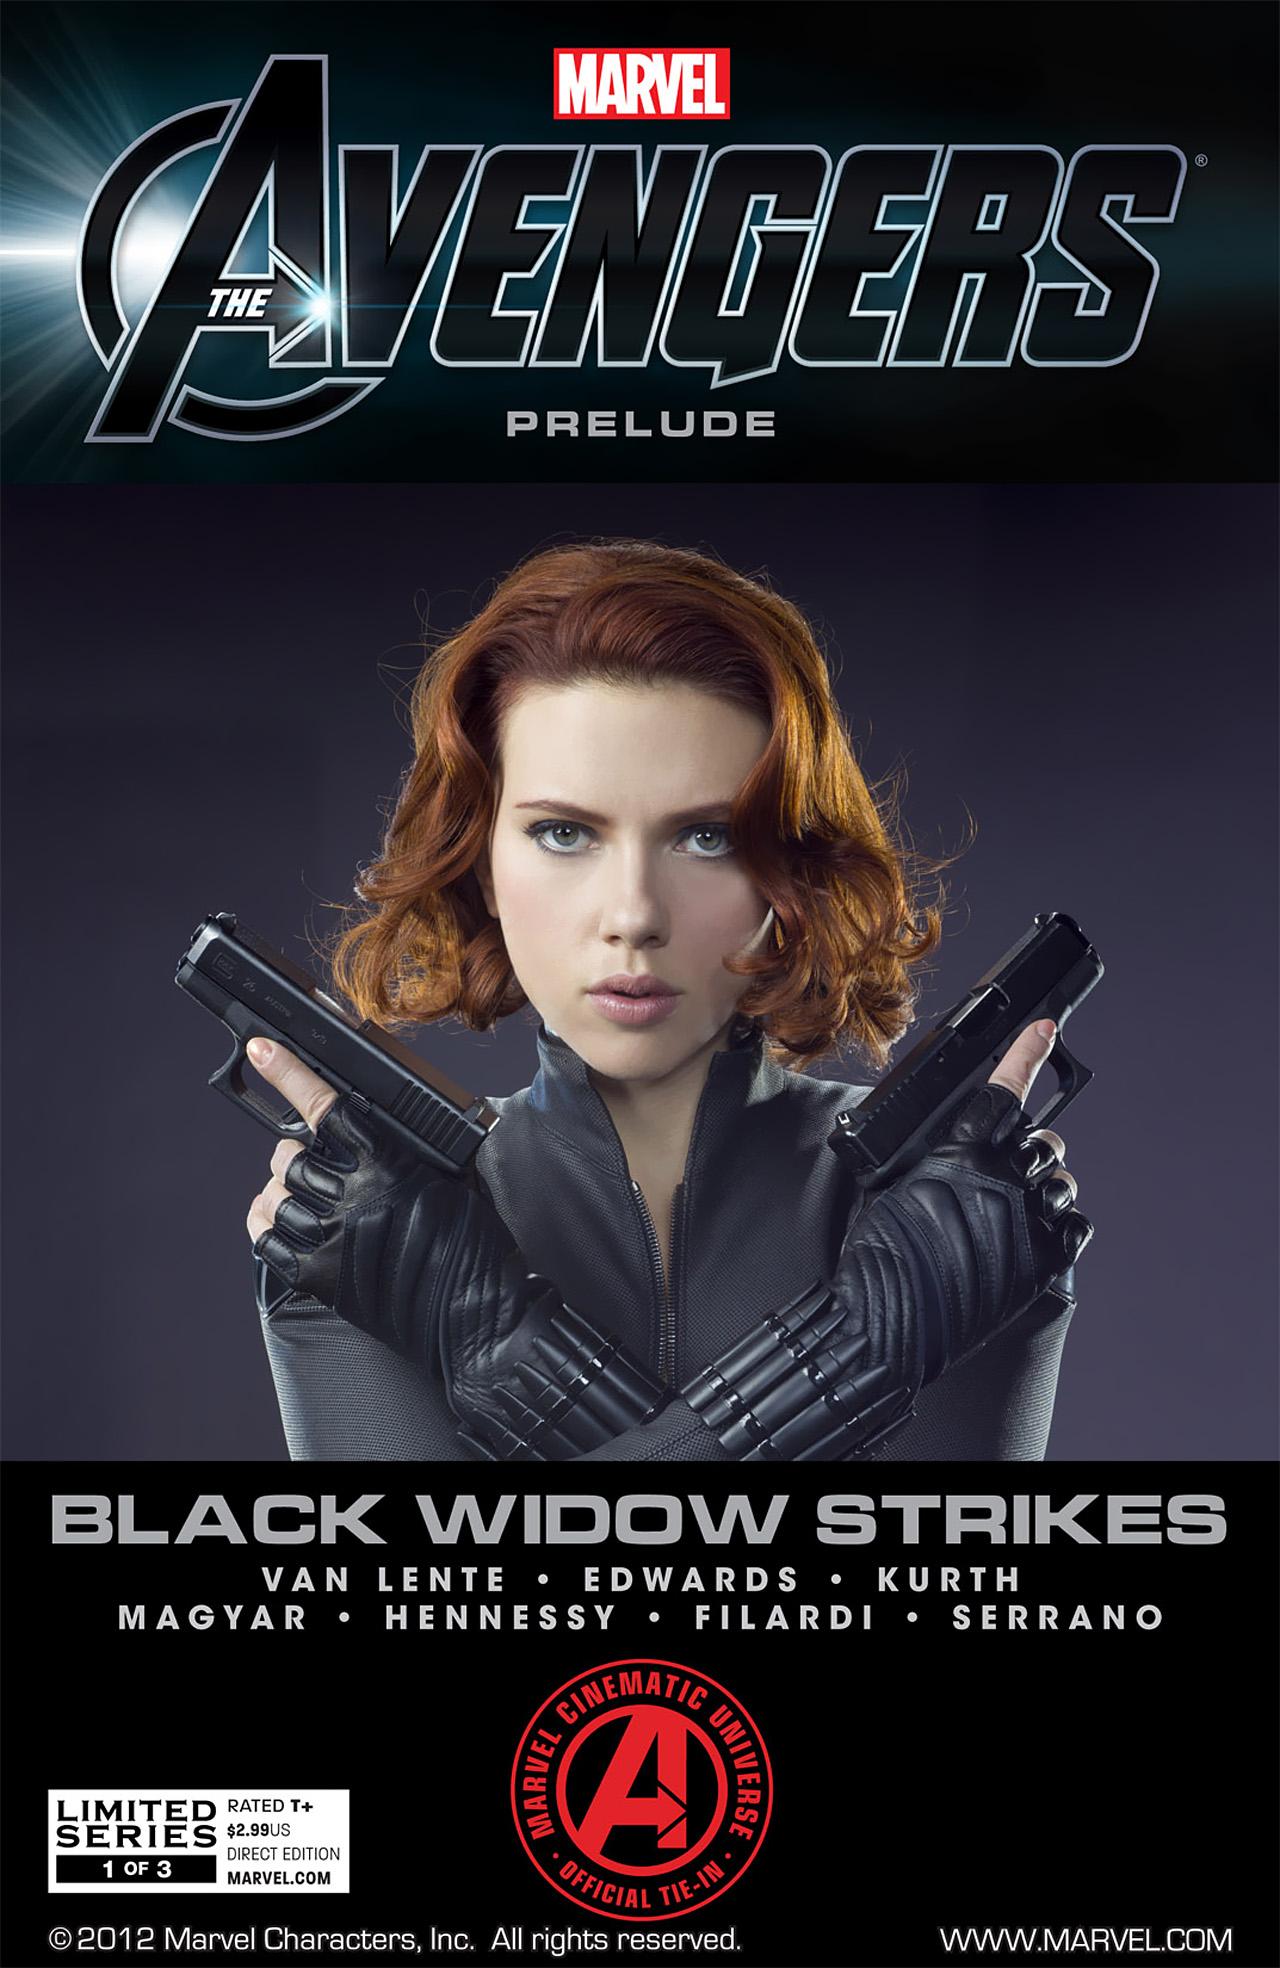 The Avengers Prelude: Black Widow Strikes   Marvel Cinematic